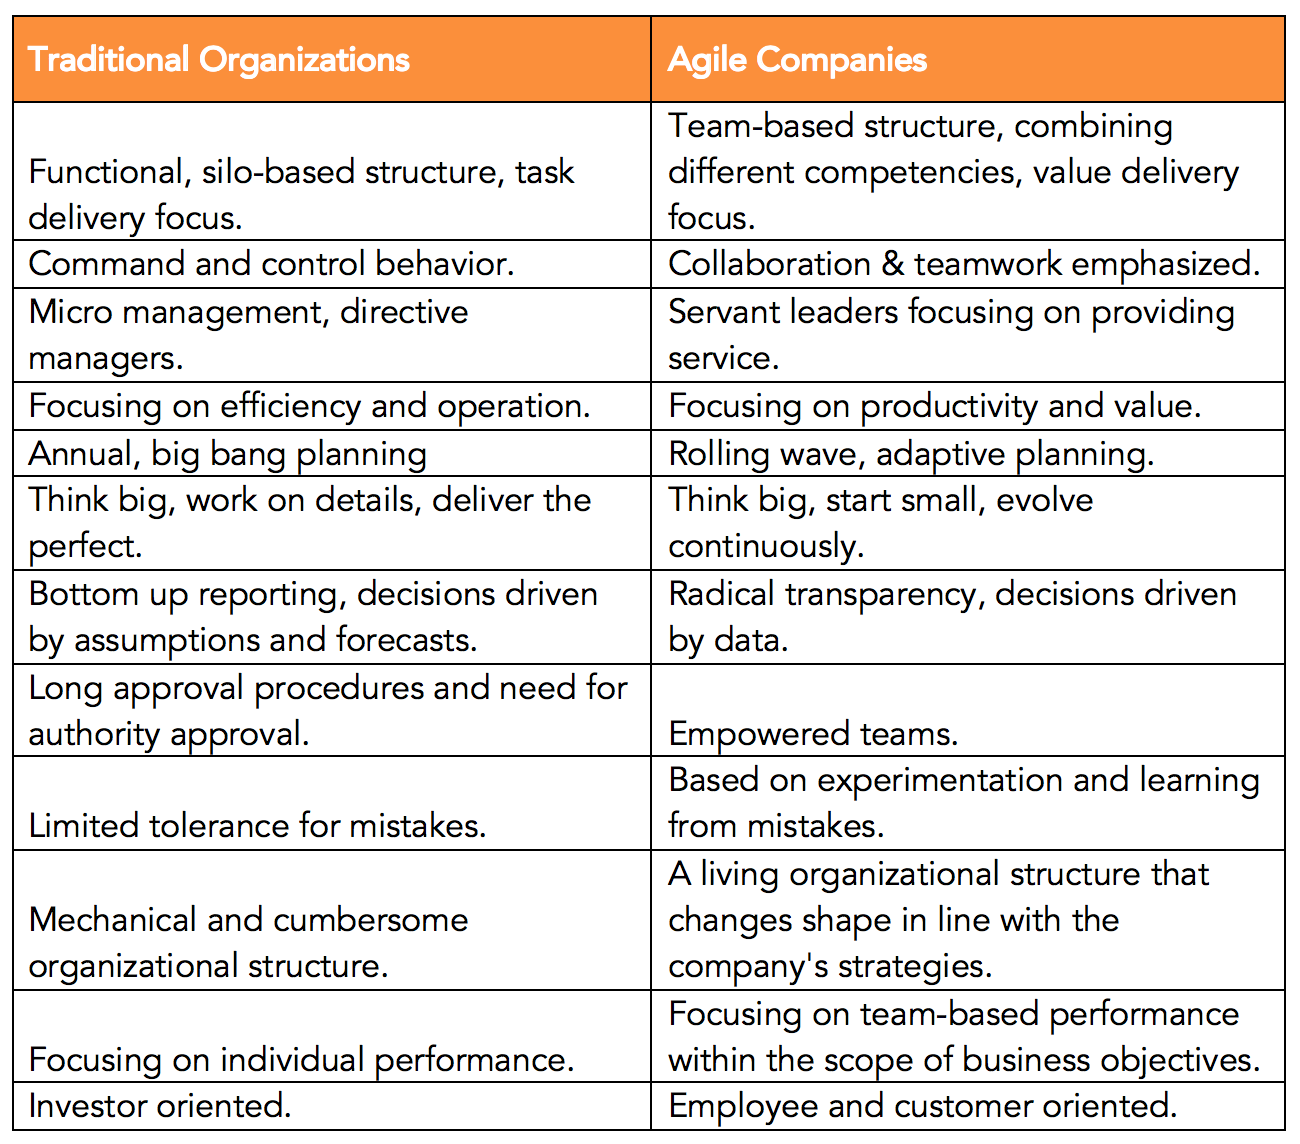 Agile Organization Characteristics